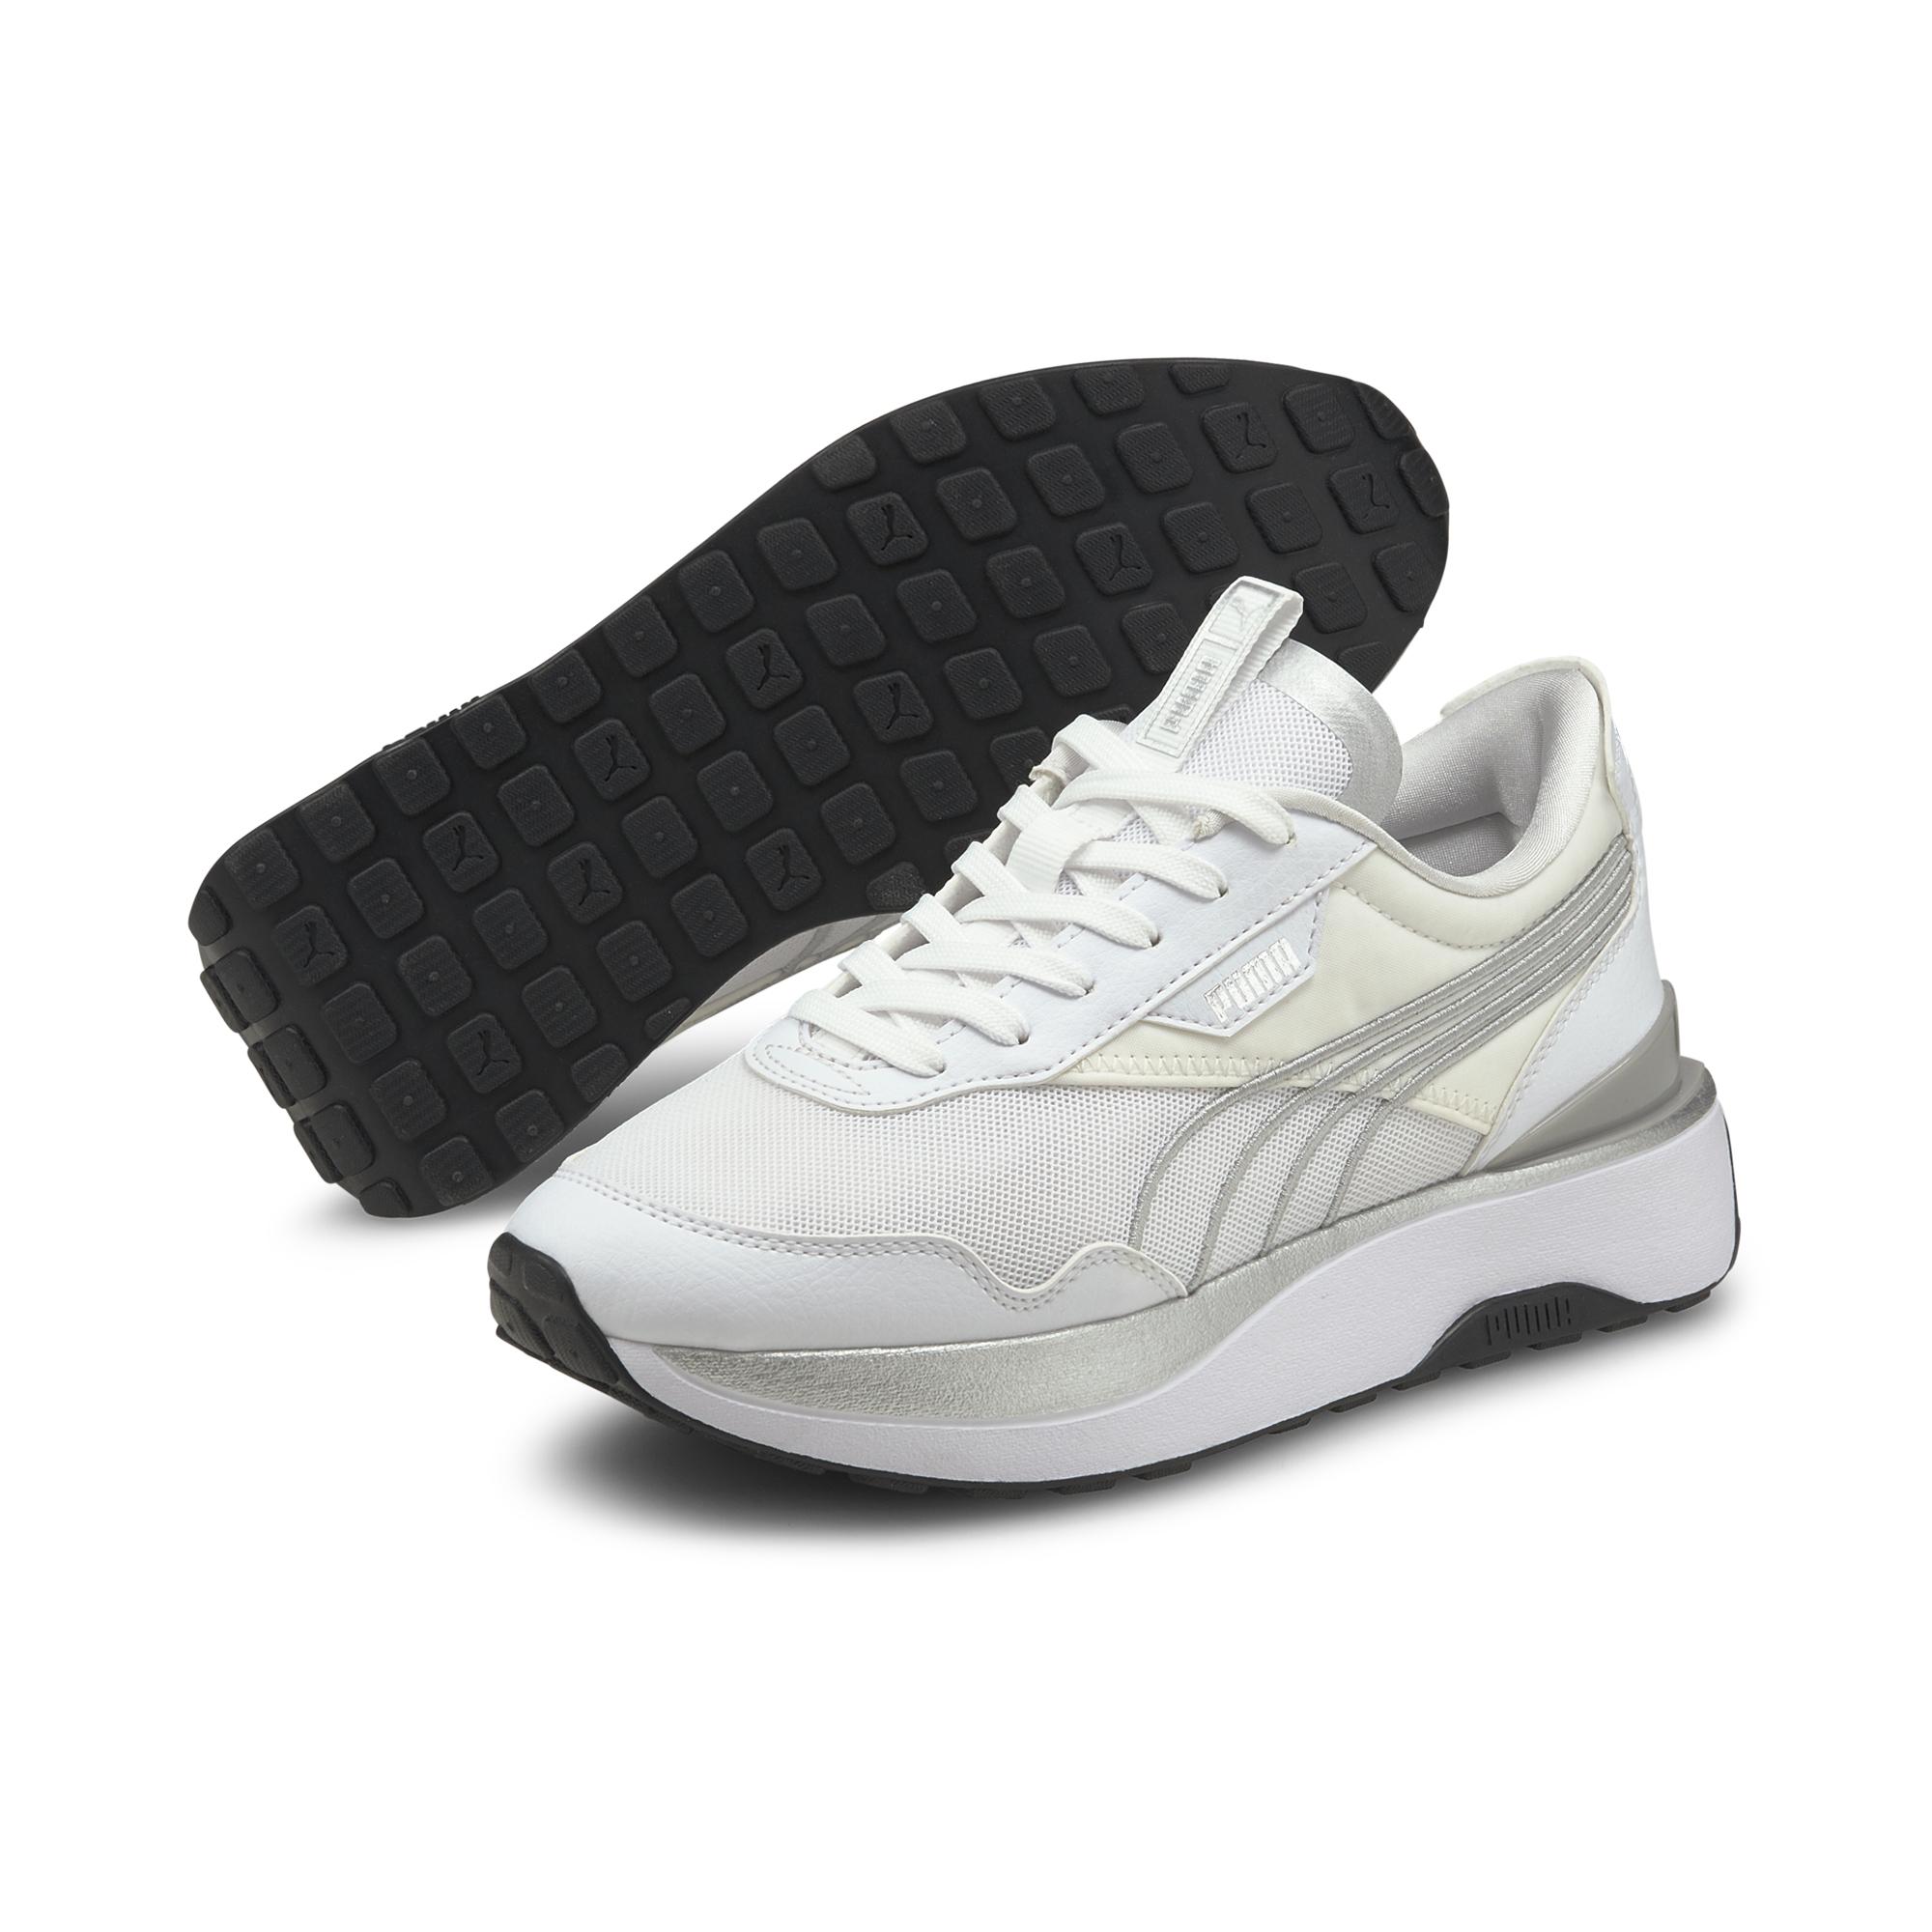 Puma Cruise Rider sneakers, white, 40